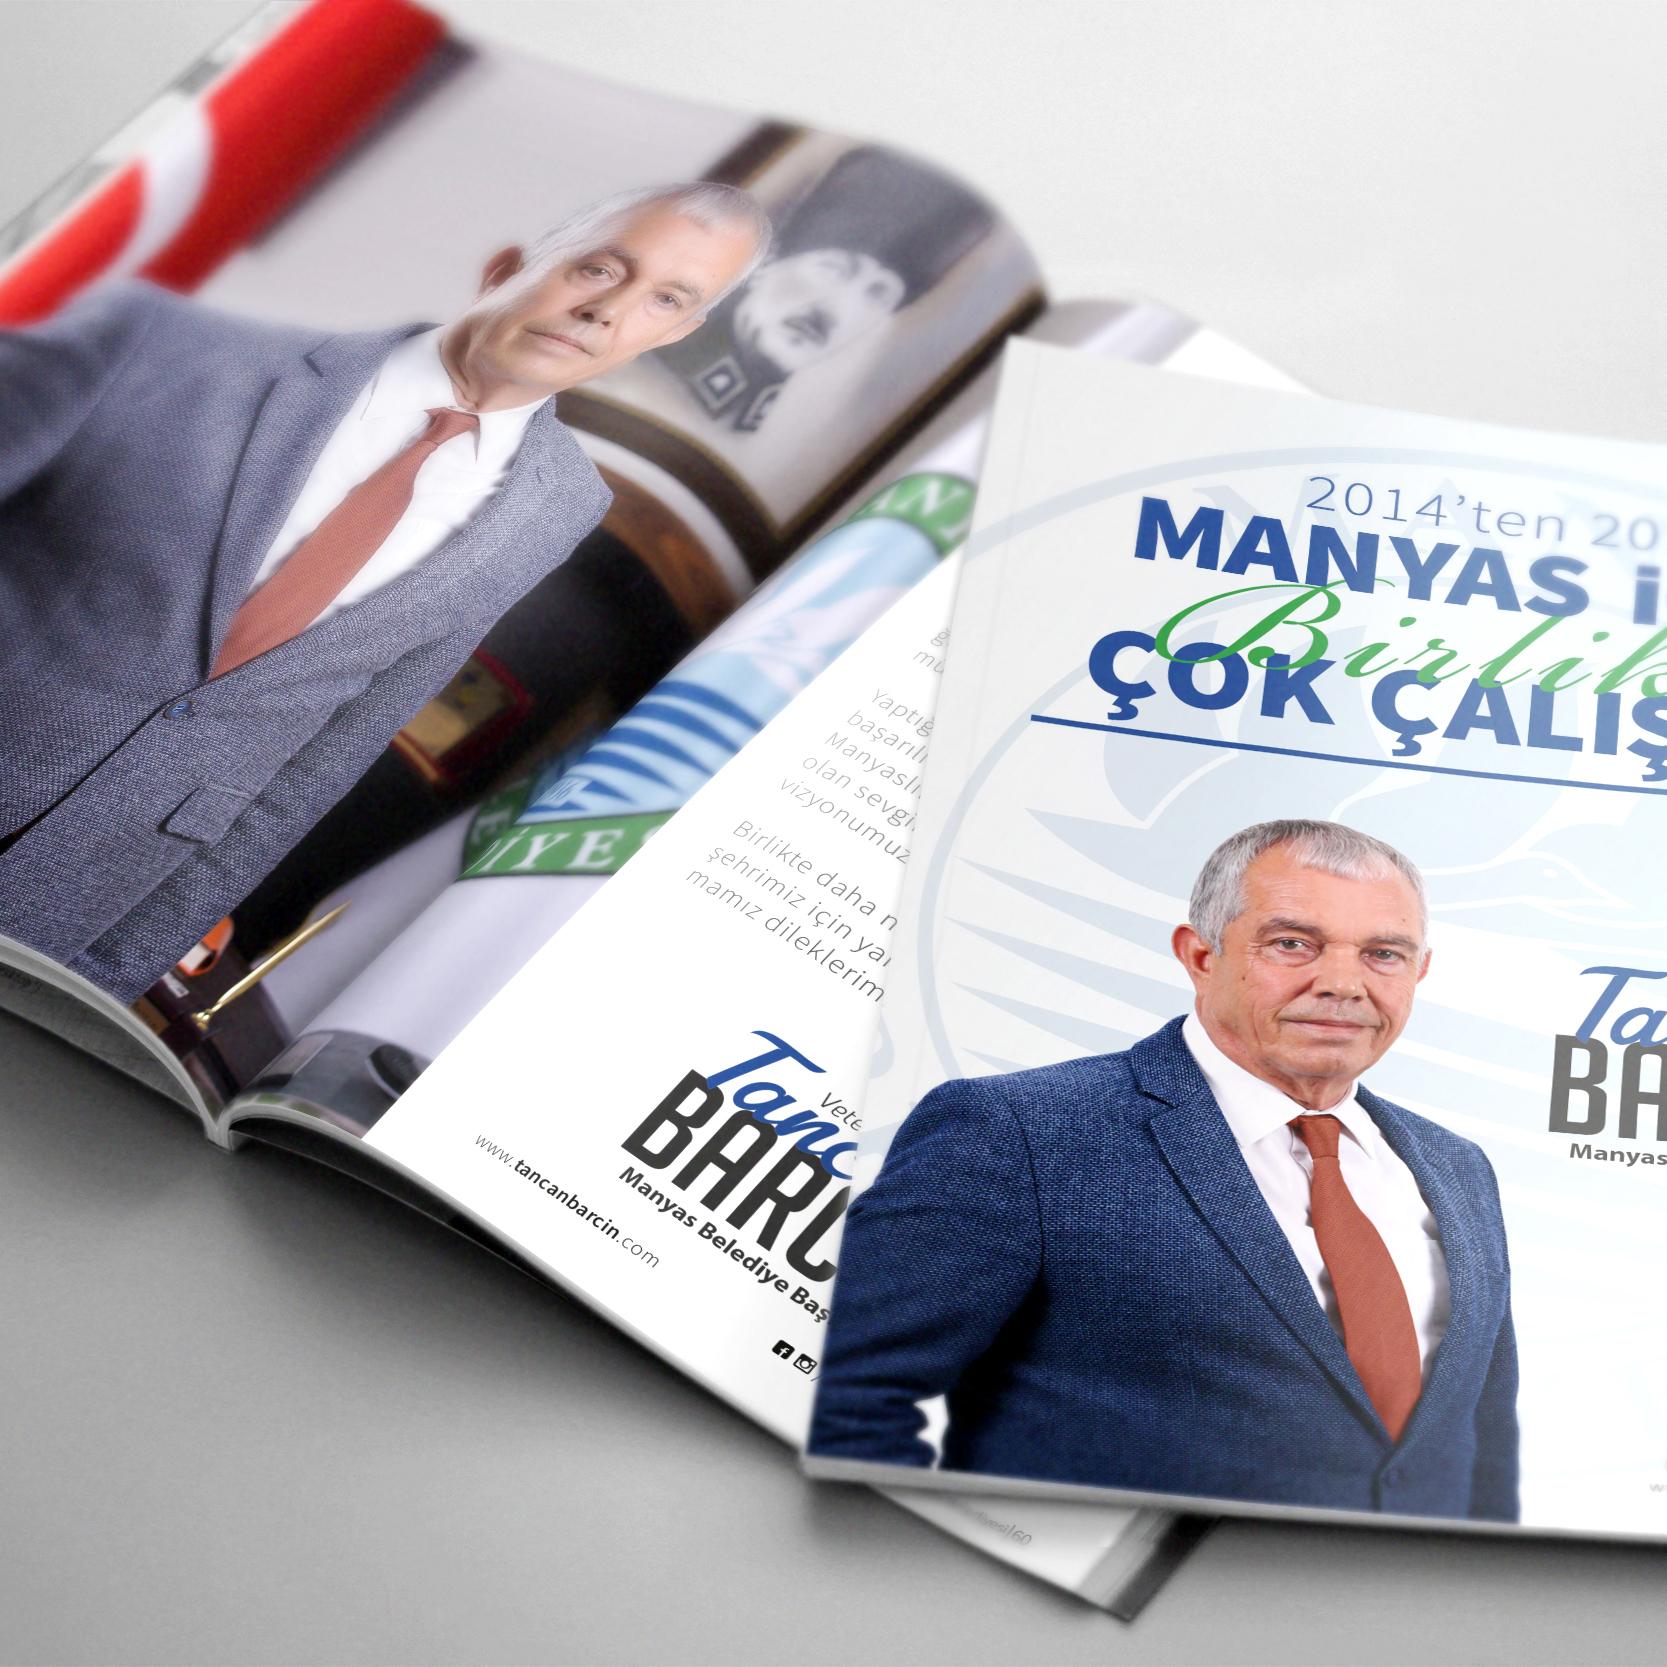 Manyas Belediyesi Katalog